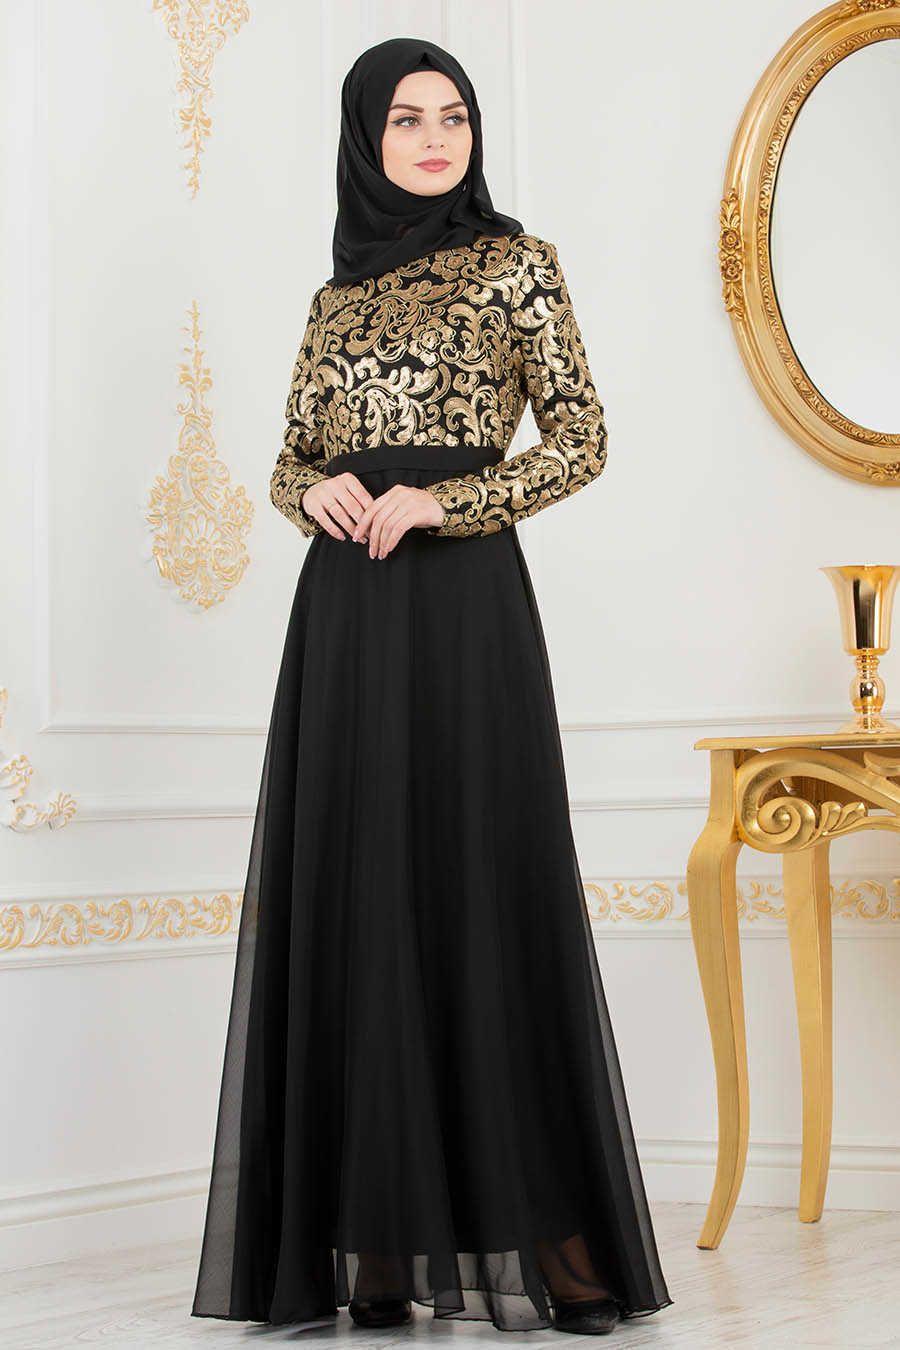 Neva Style Black Hijab Evening Dress 81620s Gaya Berpakaian Mode Wanita Gaun Hitam